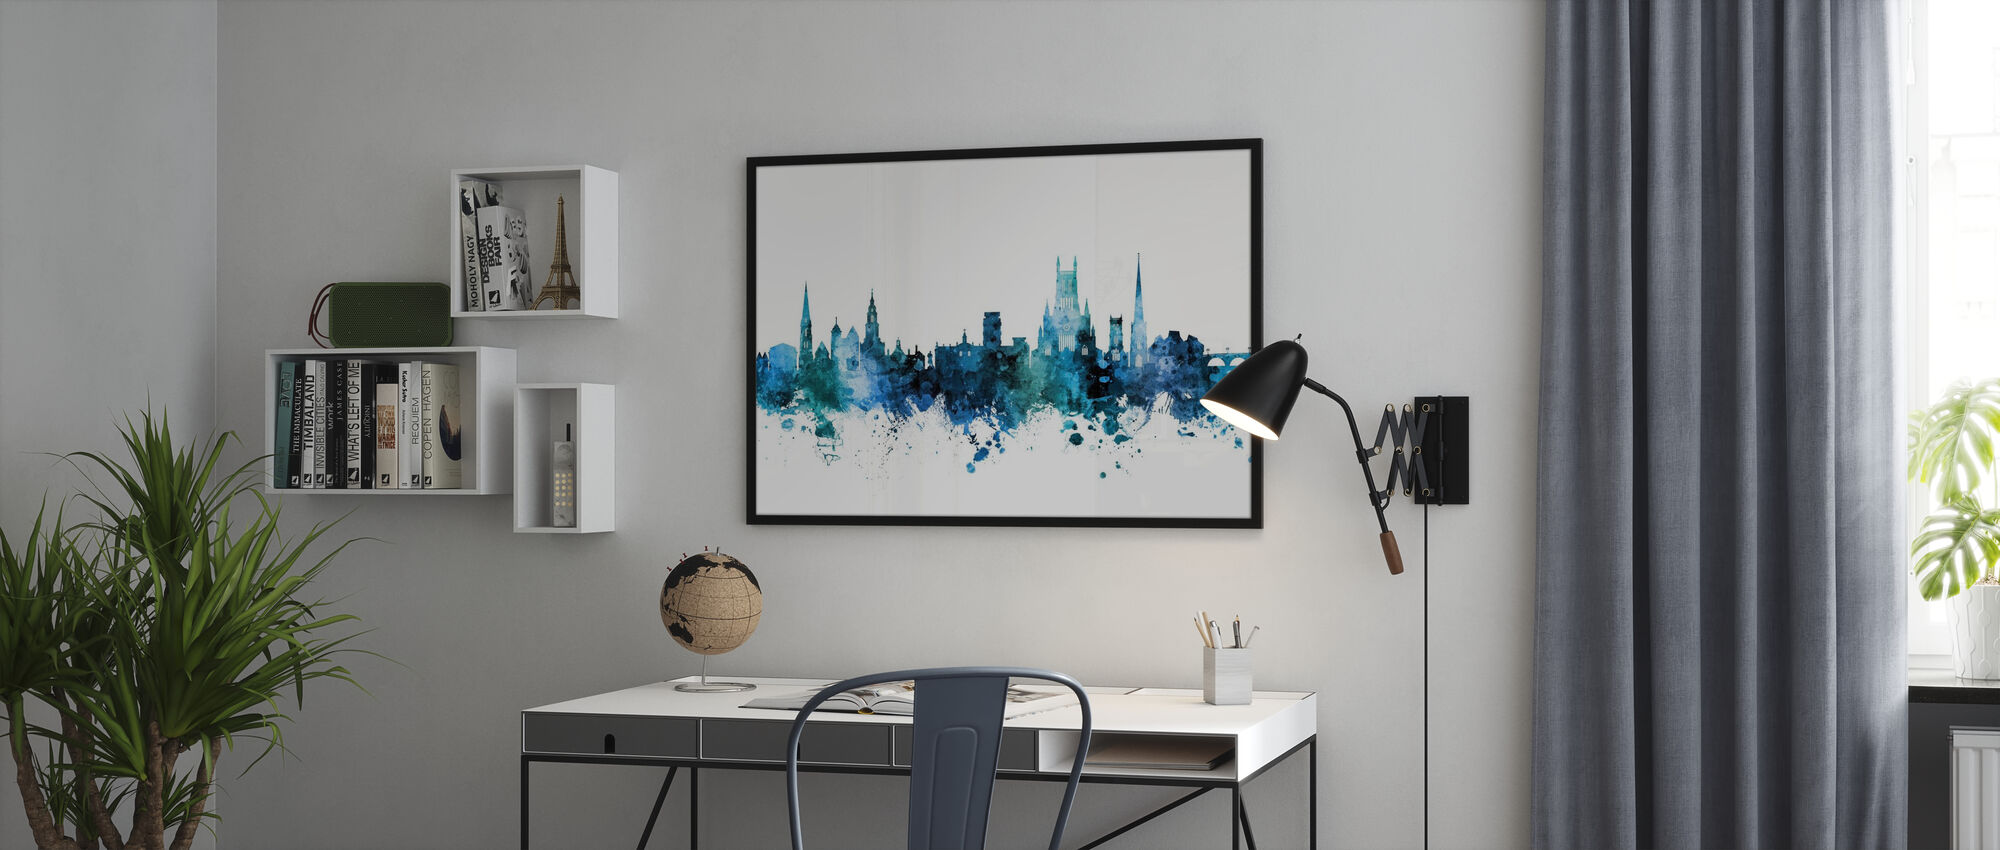 Worcester England Skyline - Plakat - Kontor